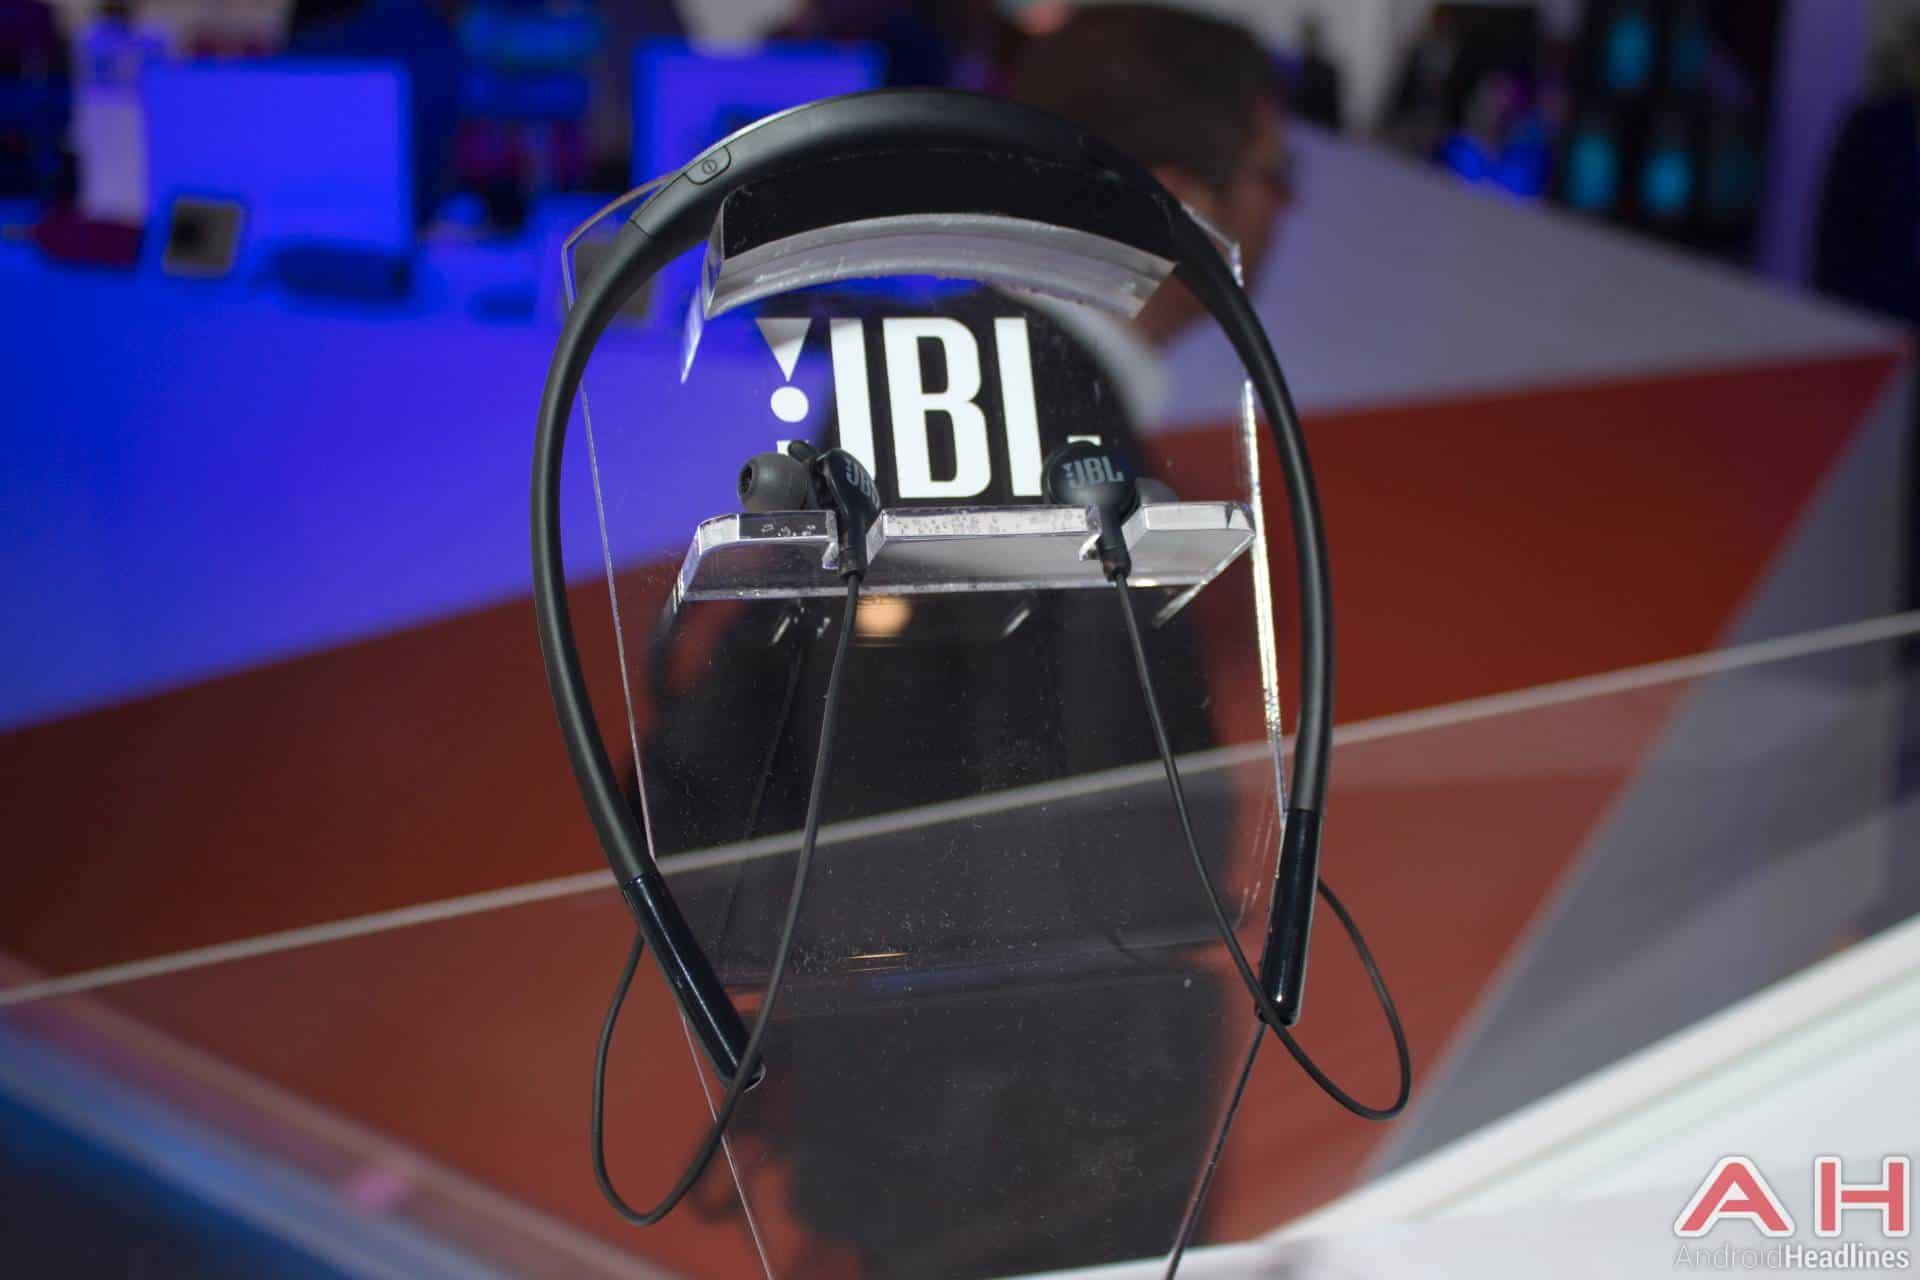 Jbl Stereo Wireless Headset Sport Everest 100 Page 5 Daftar In Ear Headphone Hitam Update Harga Terbaru Indonesia